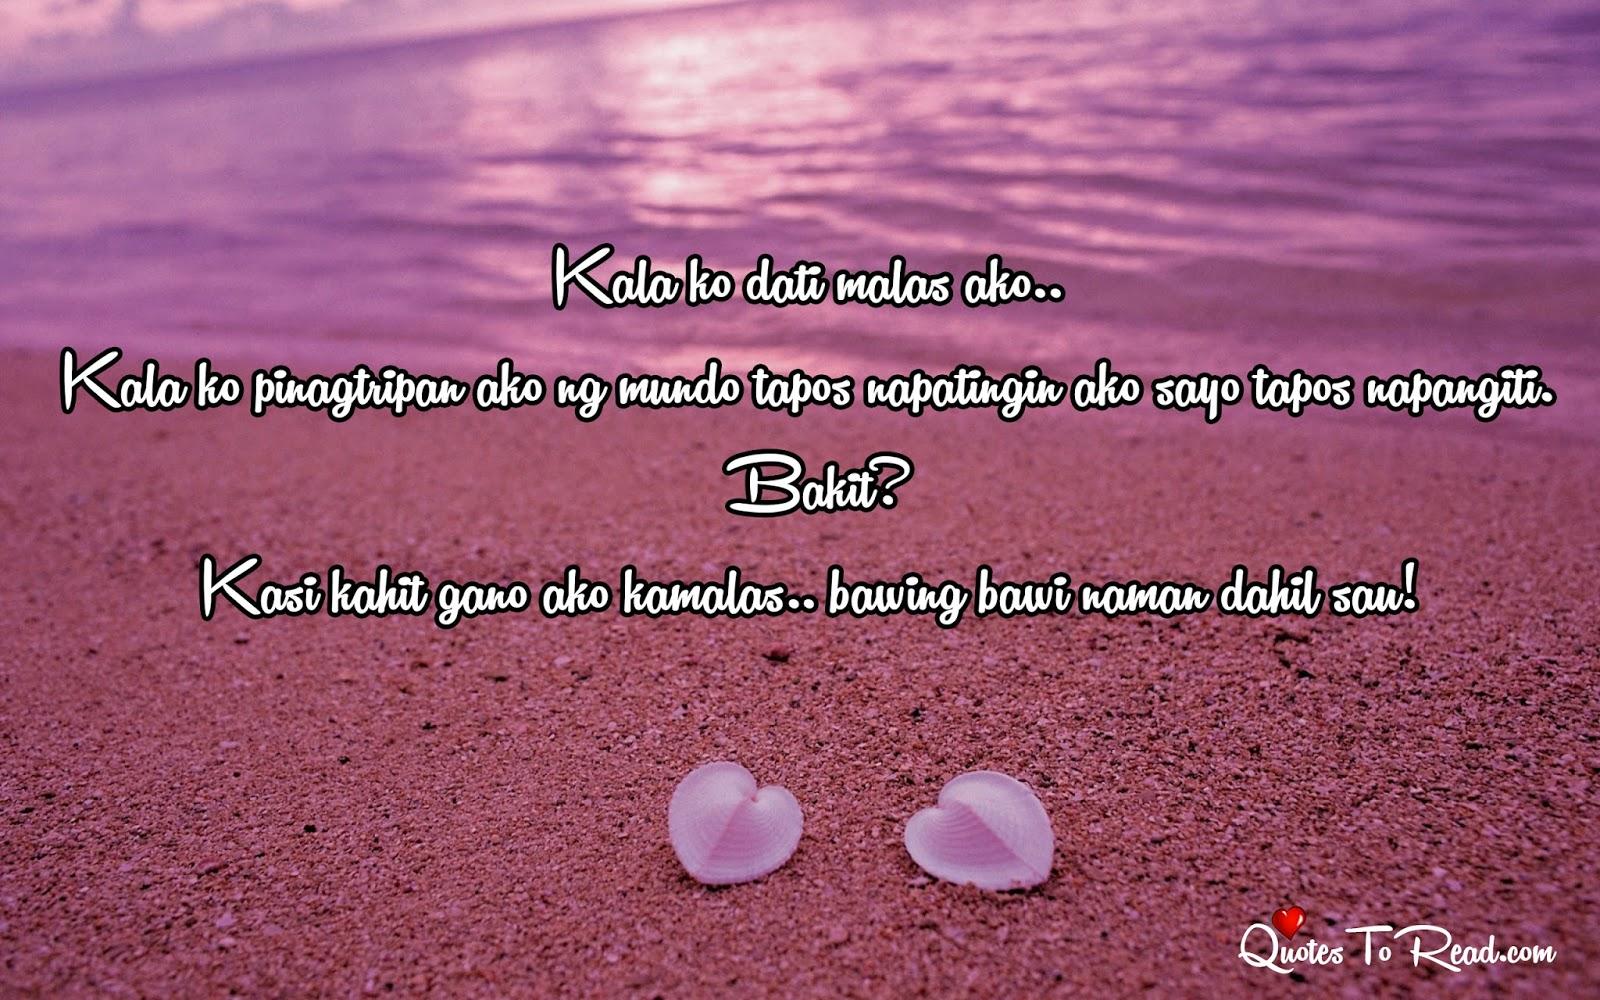 Tagalog Love Quotes Tagalog Love Quotes  Quotes To Read